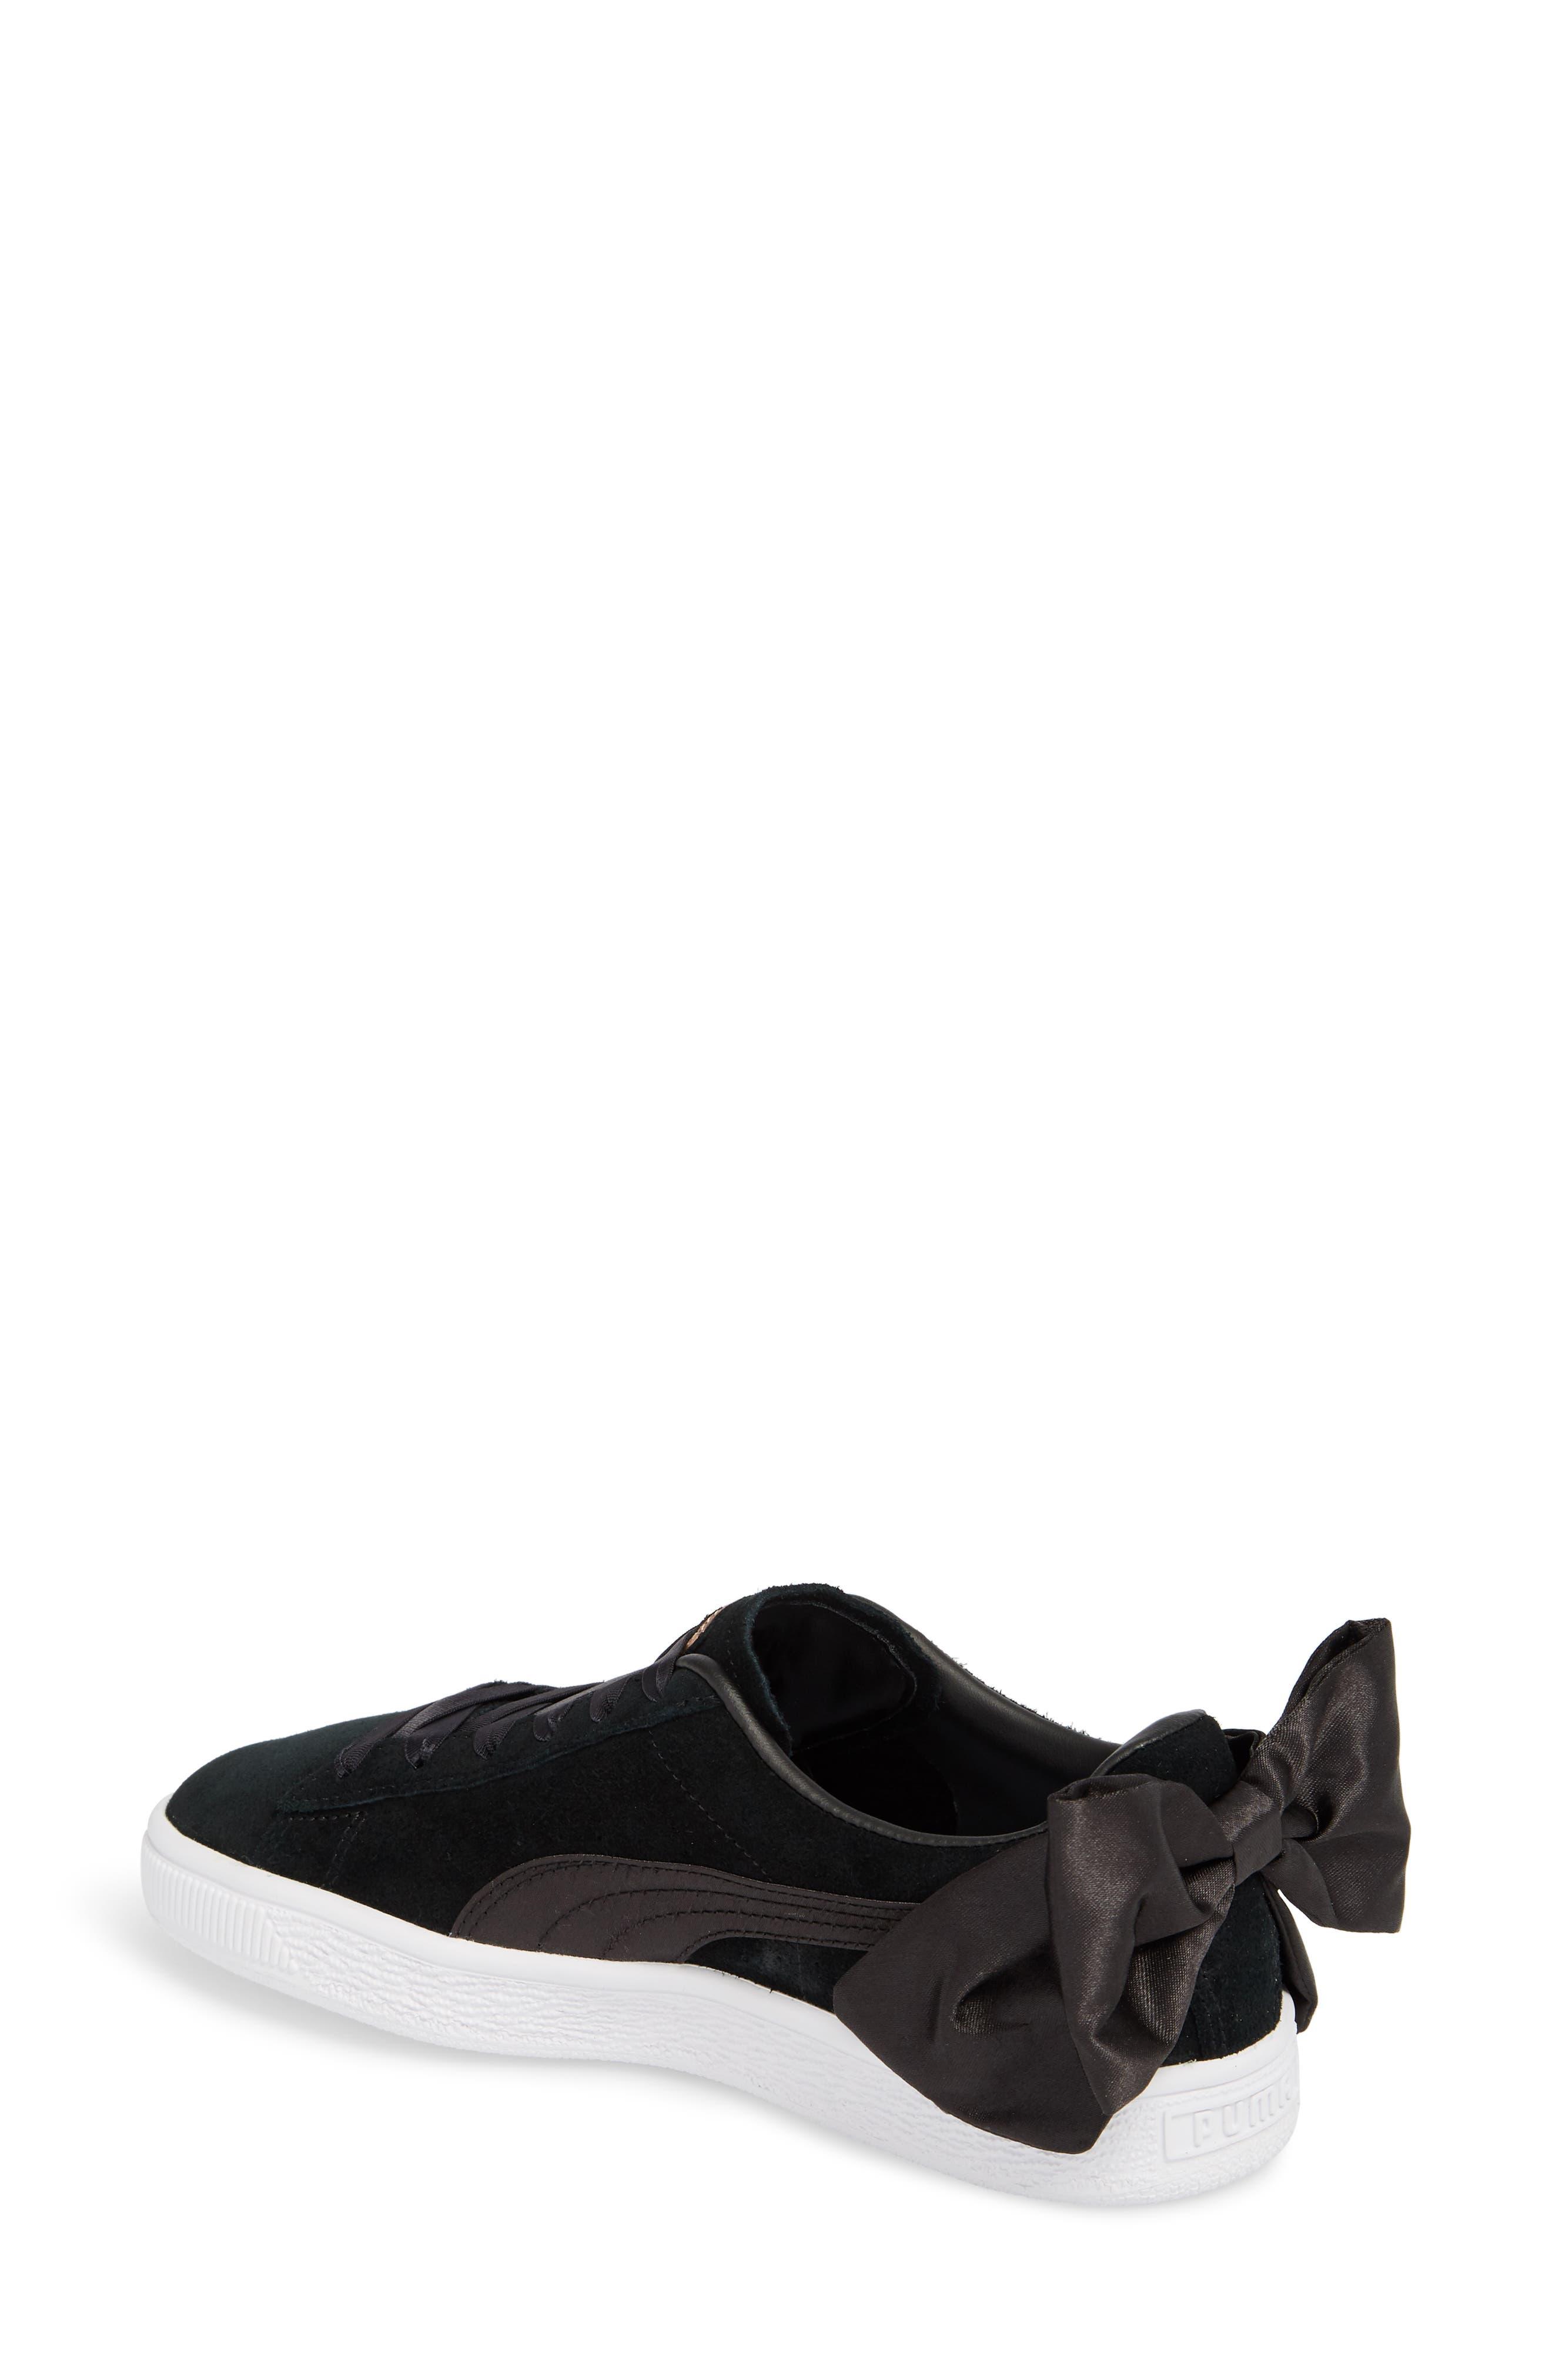 Bow Sneaker,                             Alternate thumbnail 2, color,                             Black/ Black